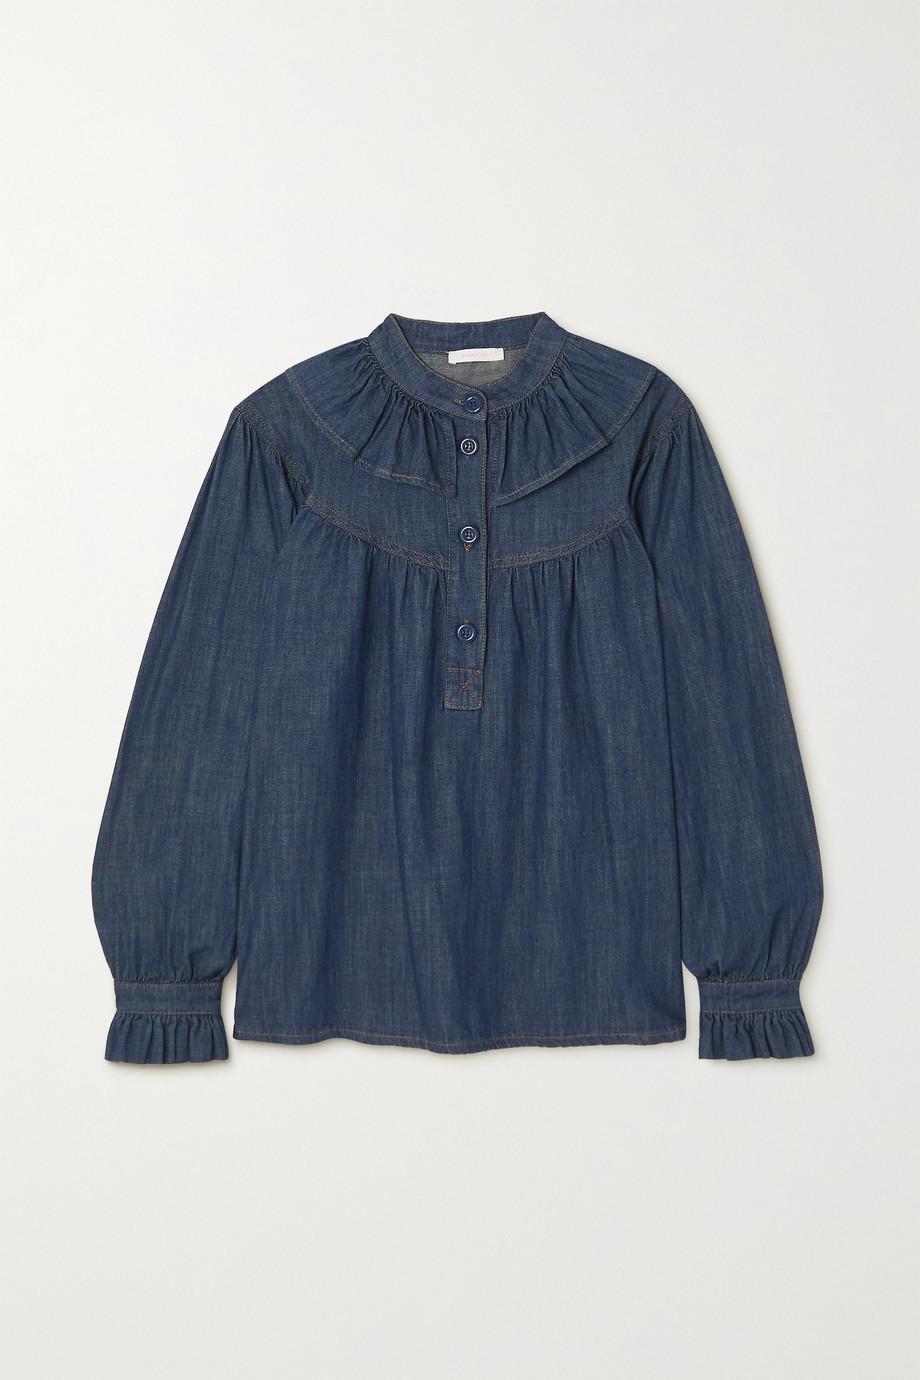 See By Chloé Ruffled denim blouse